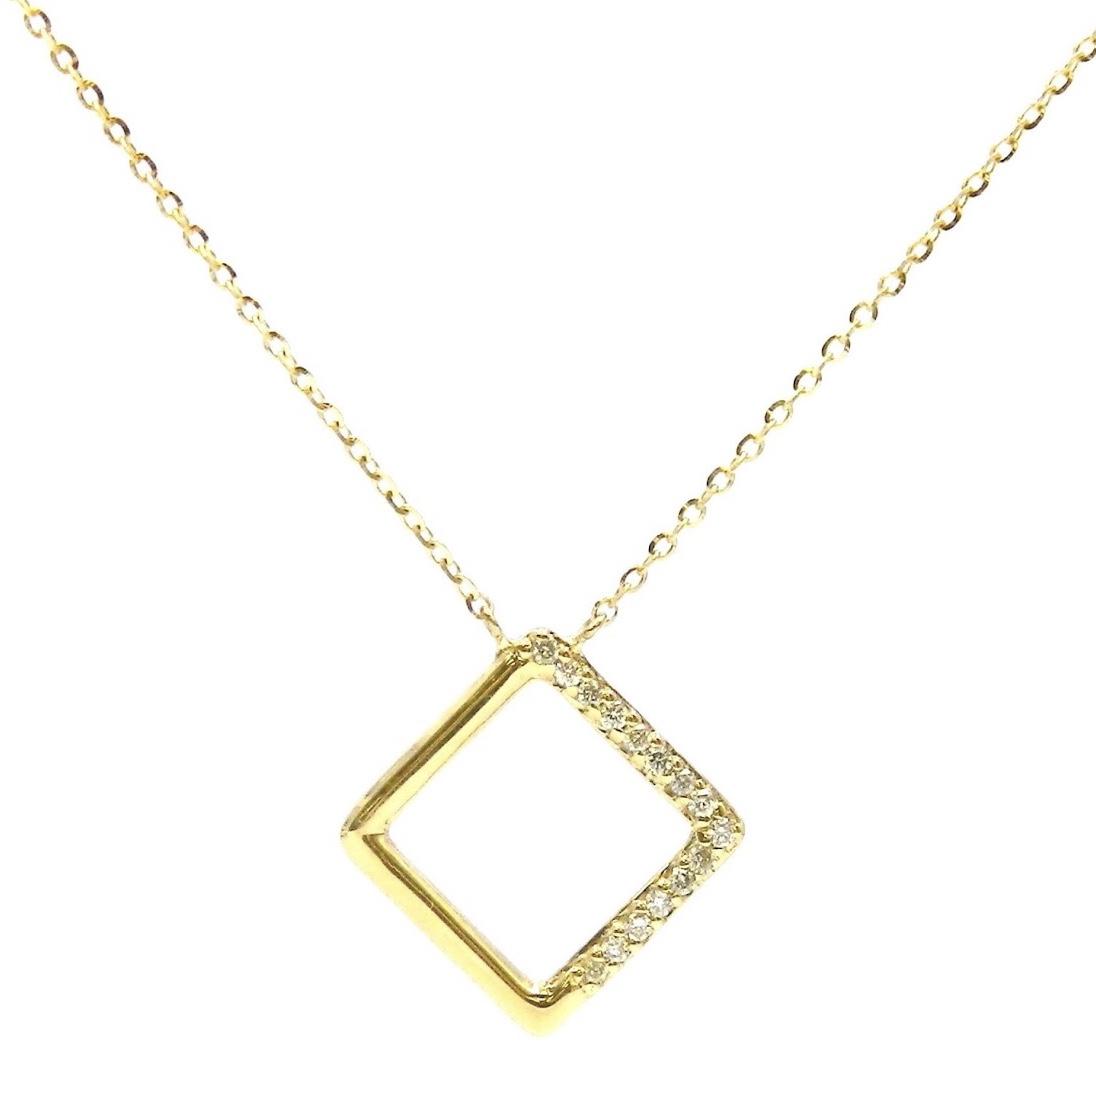 14 Karat Yellow Gold Square Diamond Necklace